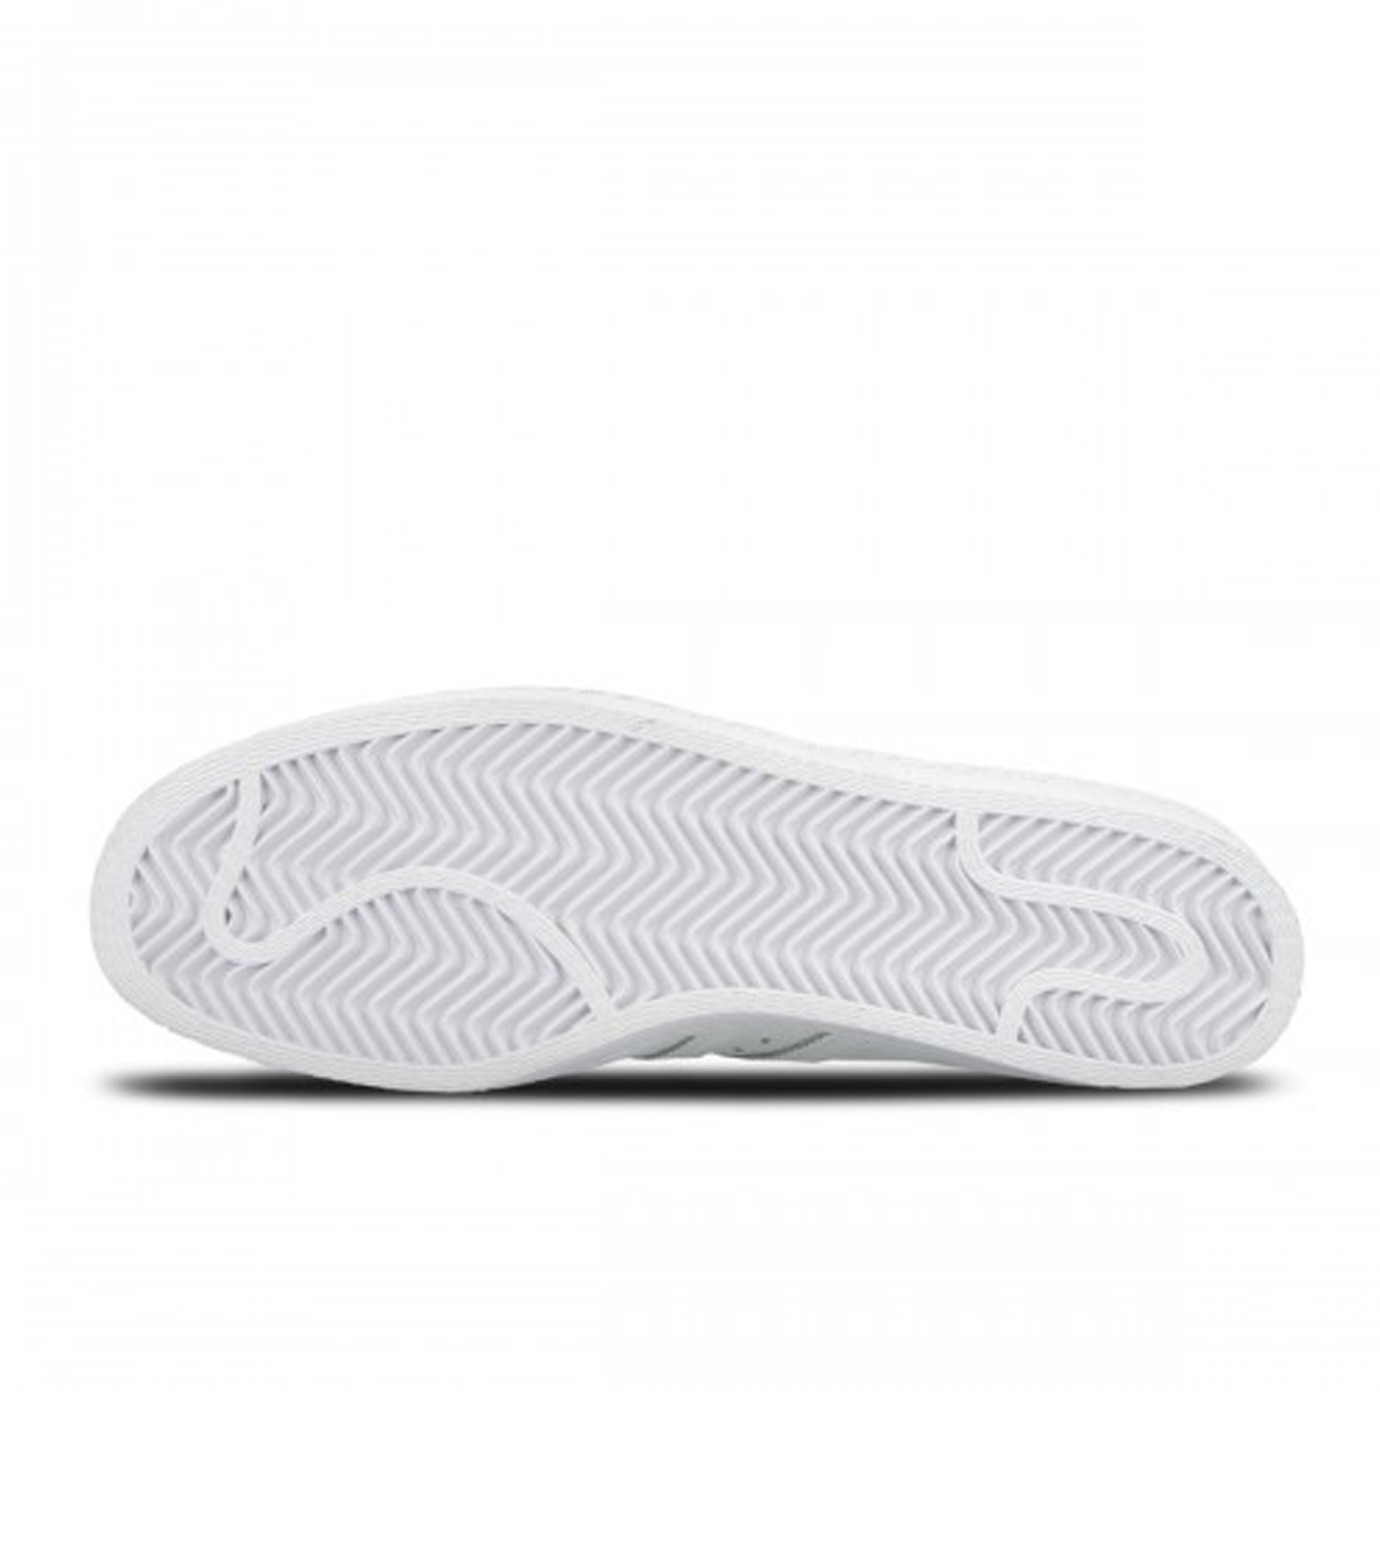 adidas(アディダス)のSUPERSTAR 80s-WHITE(シューズ/shoes)-S79443-4 拡大詳細画像2